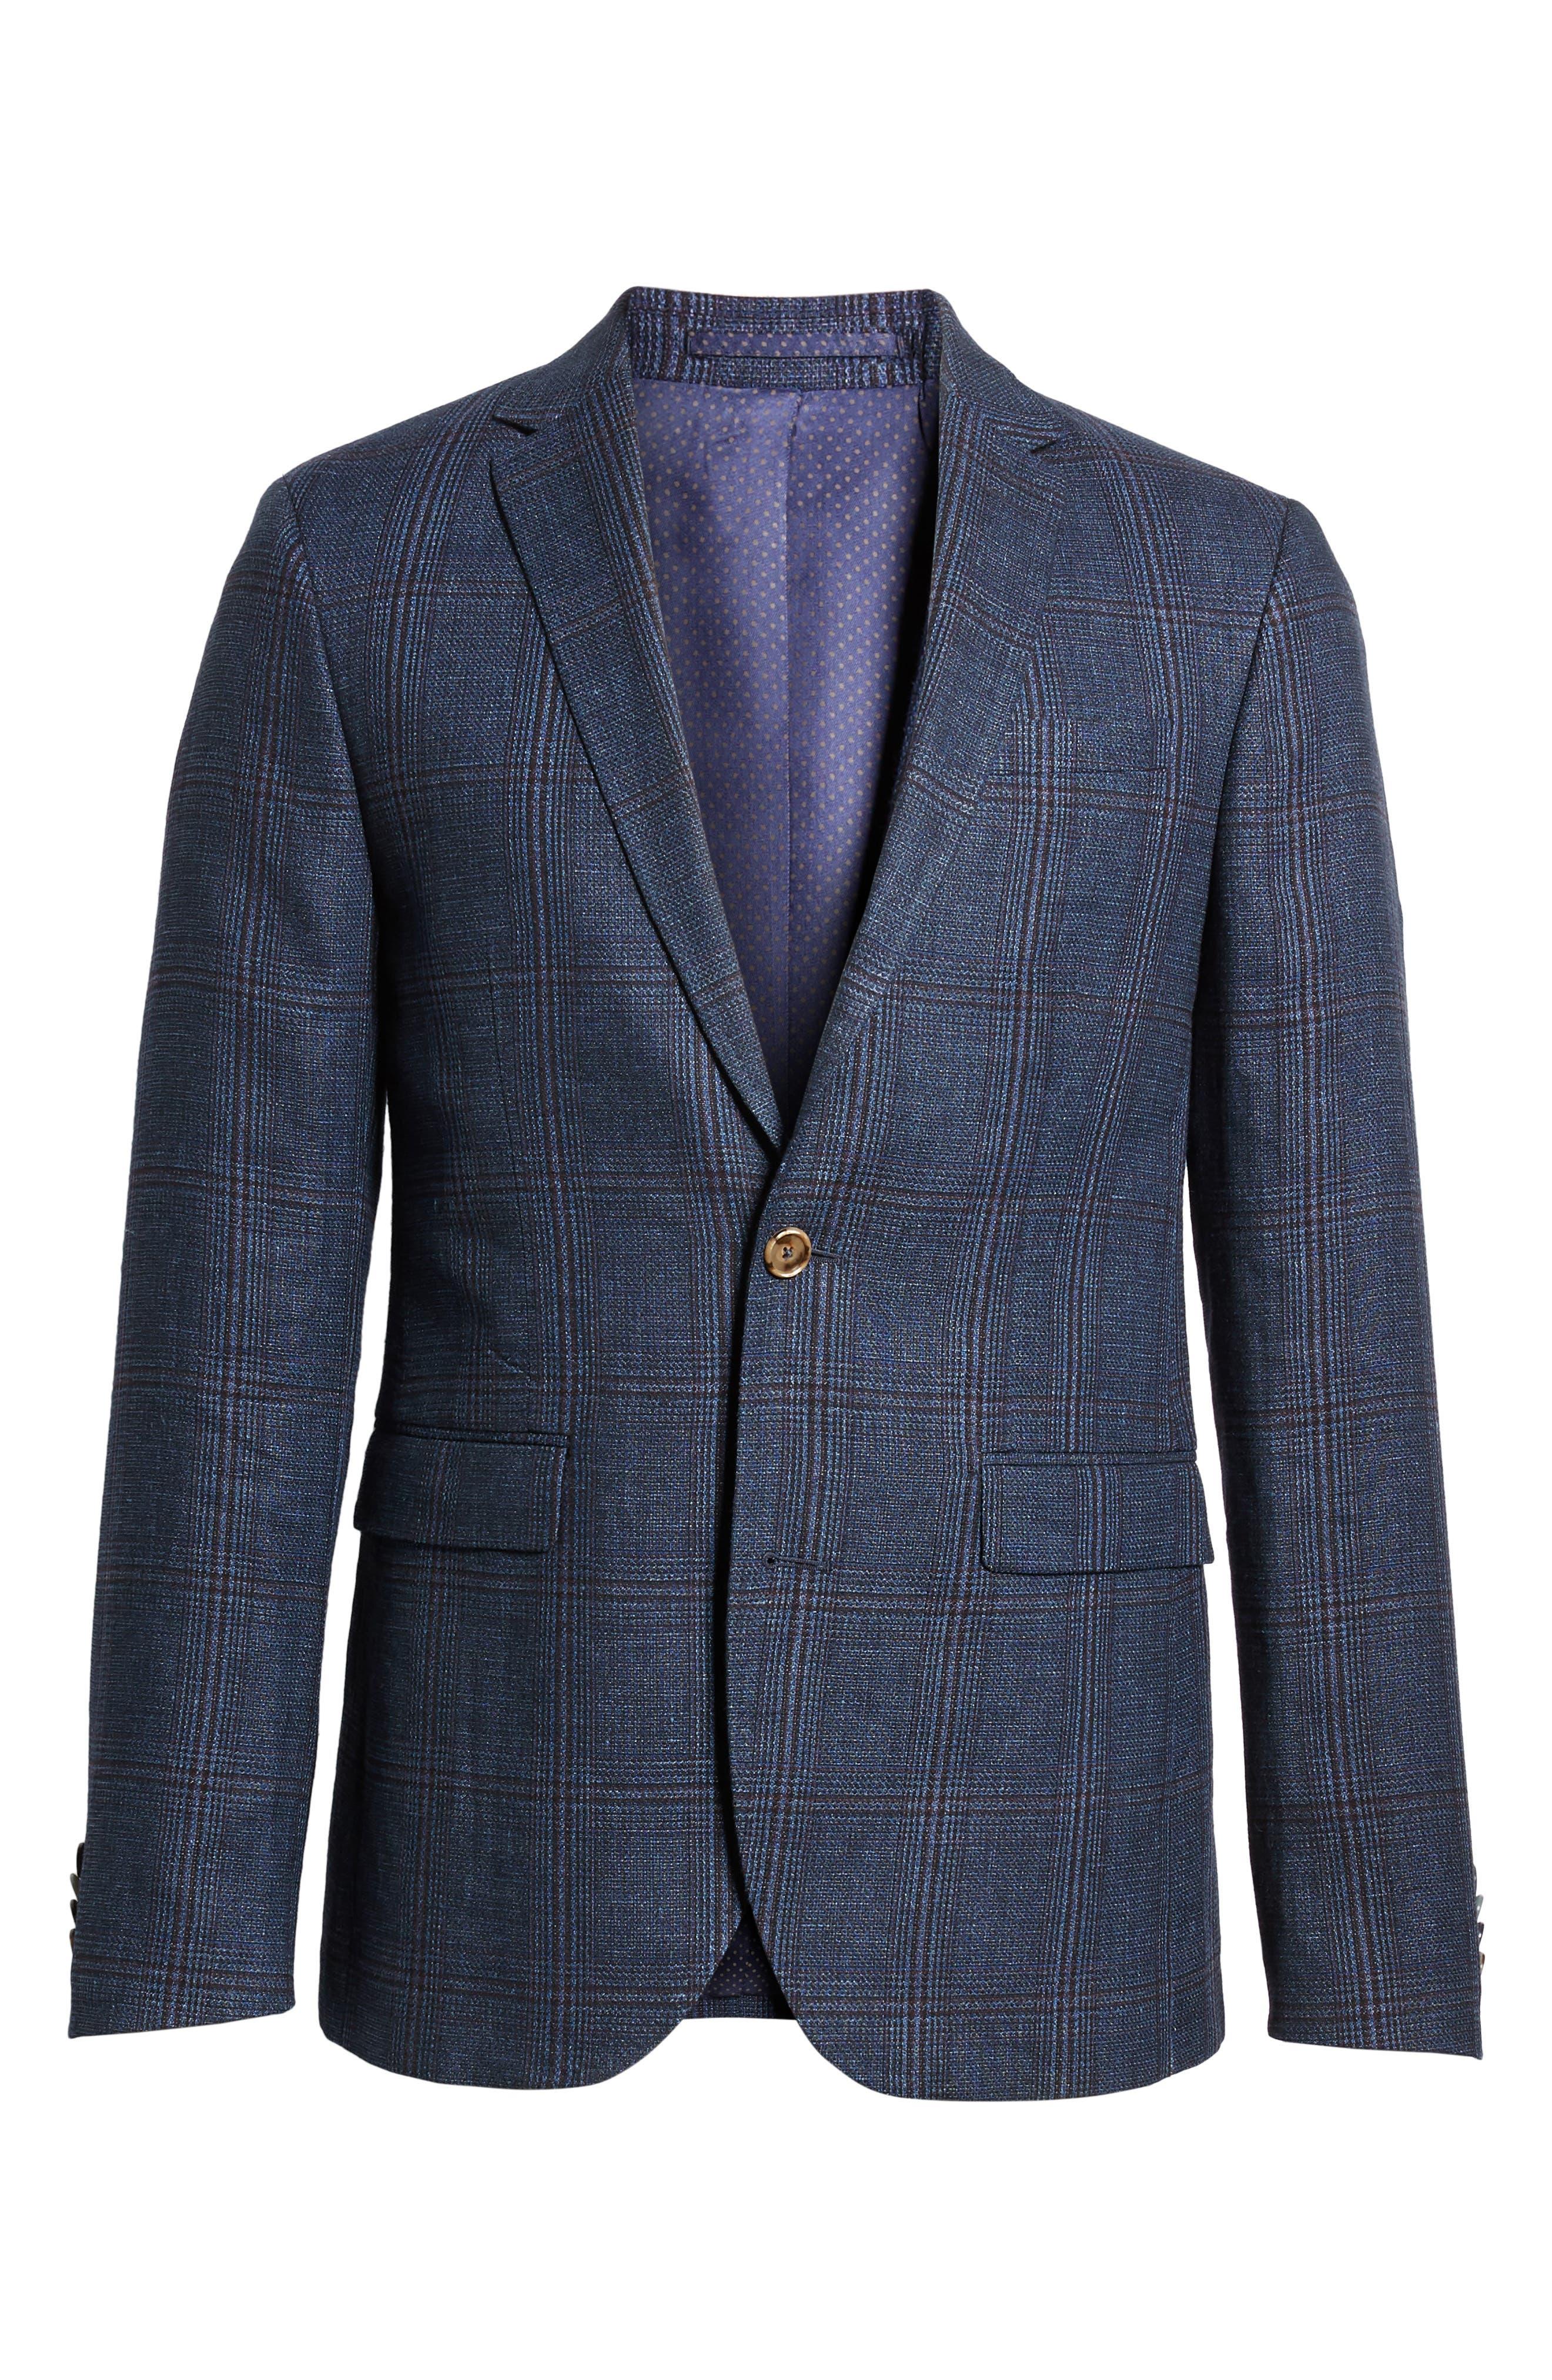 Trim Fit Plaid Linen & Wool Sport Coat,                             Alternate thumbnail 6, color,                             Navy Red